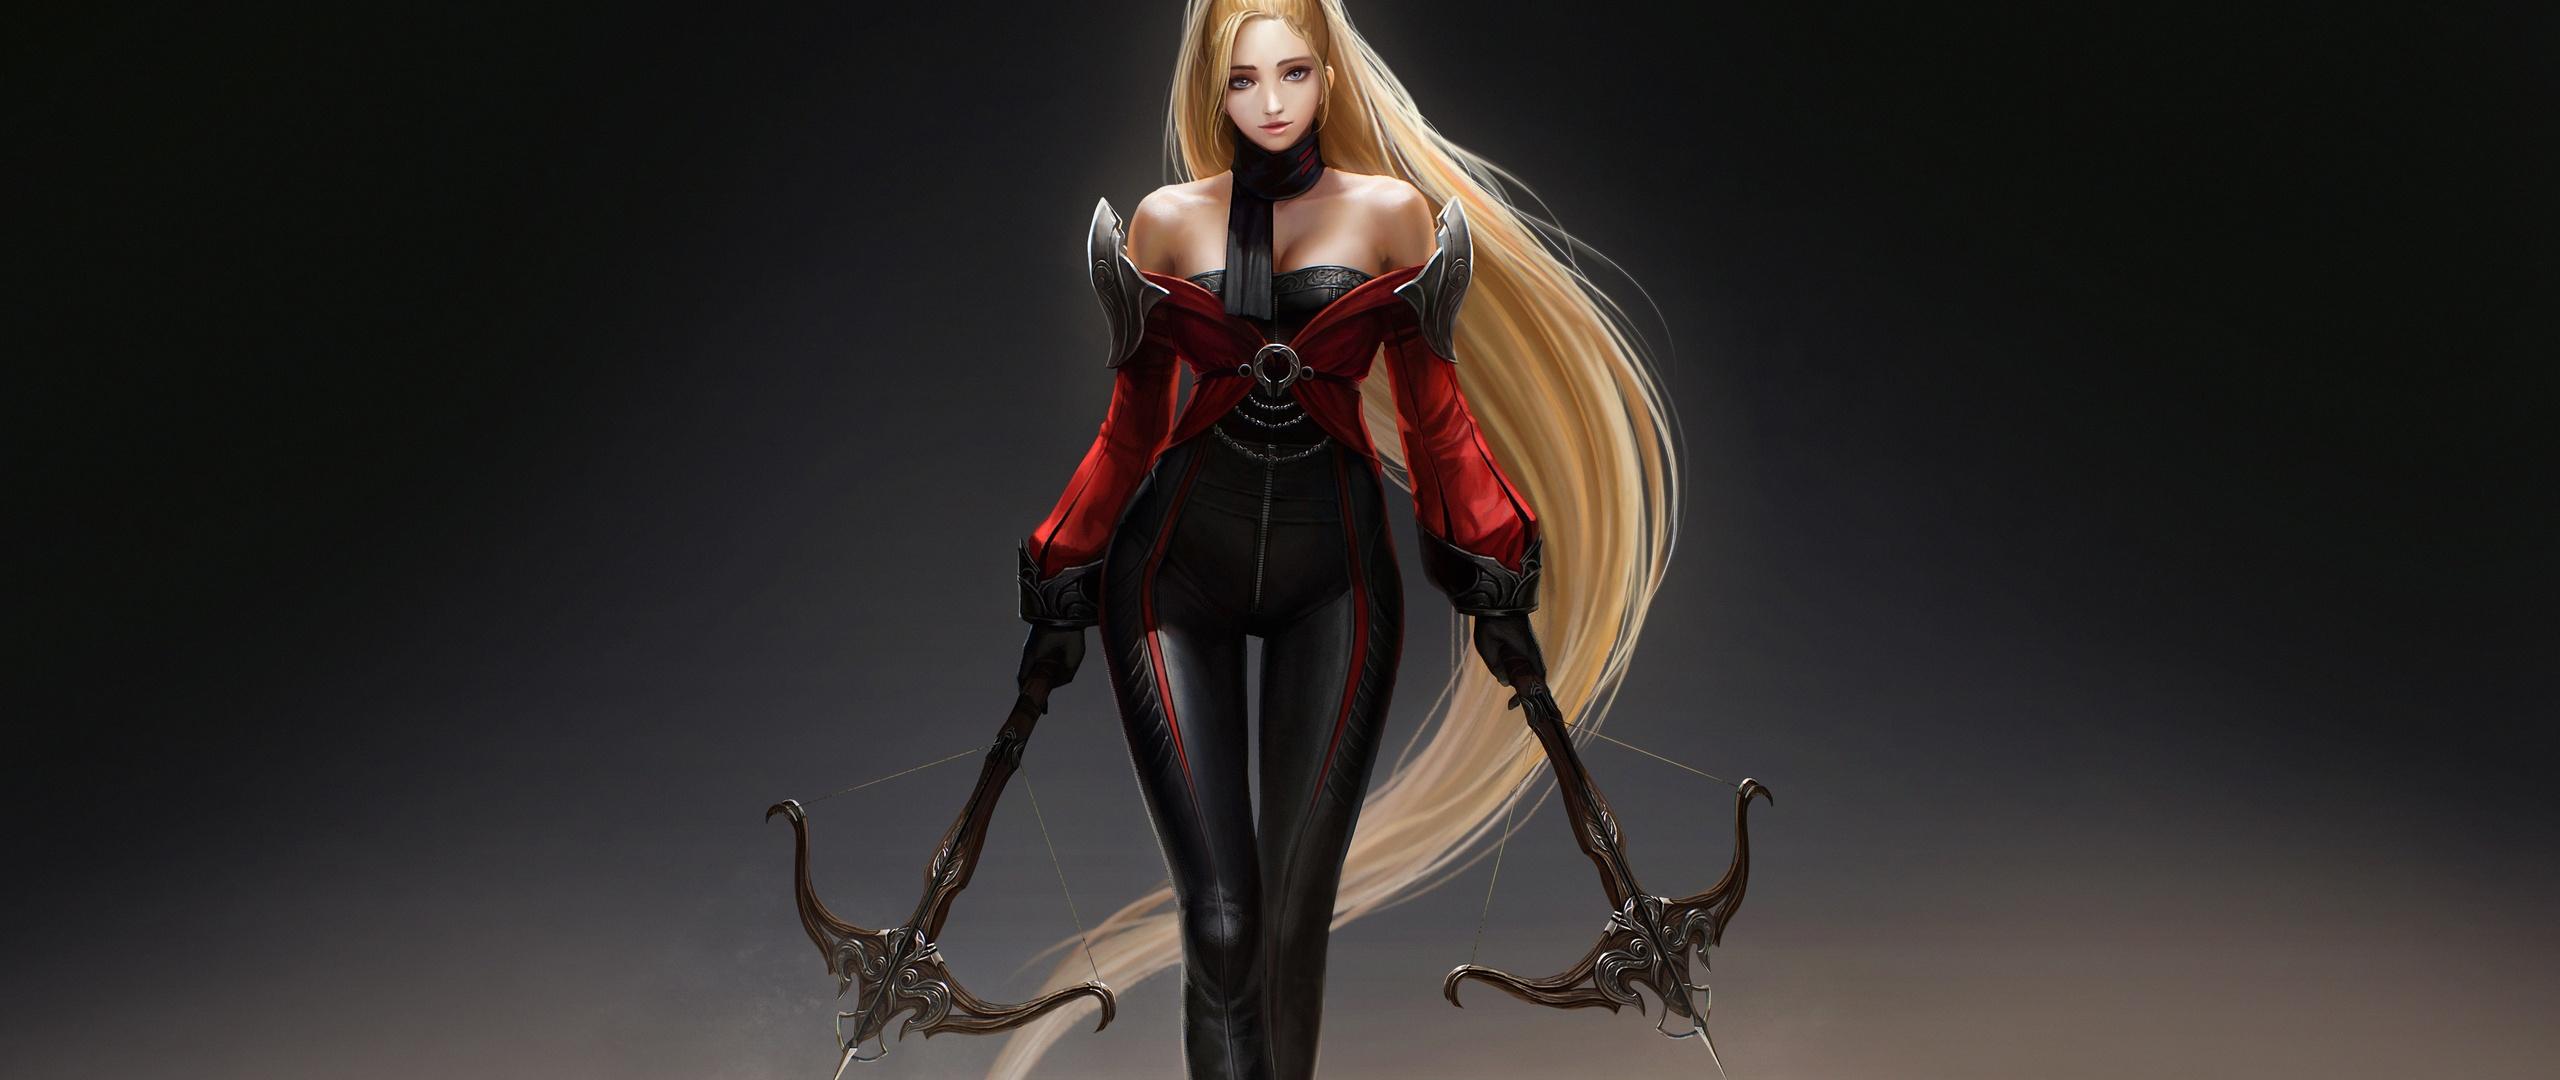 fantasy-warrior-women-4k-6g.jpg